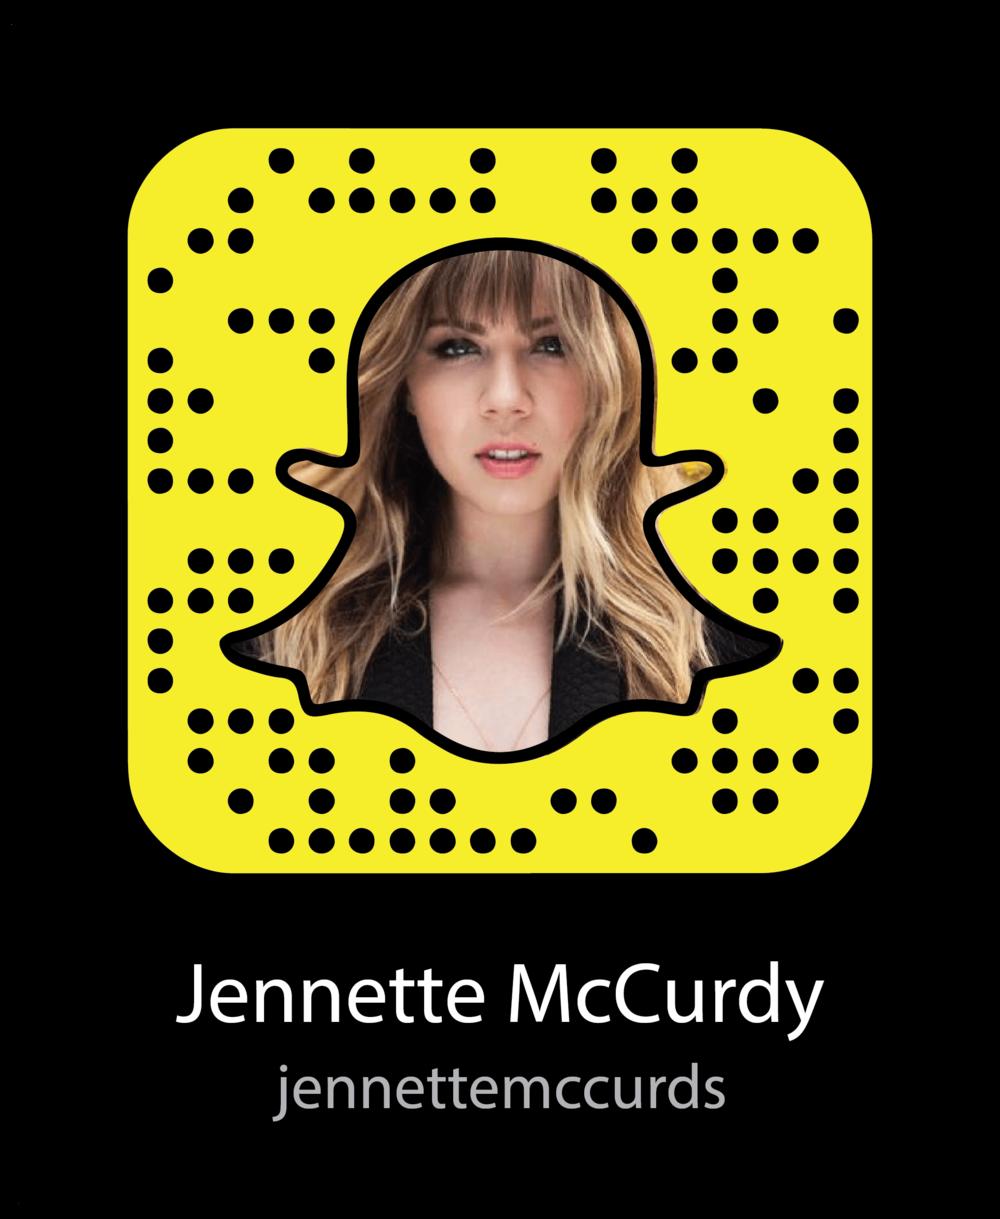 jennette-mccurdy-celebrity-snapchat-snapcode